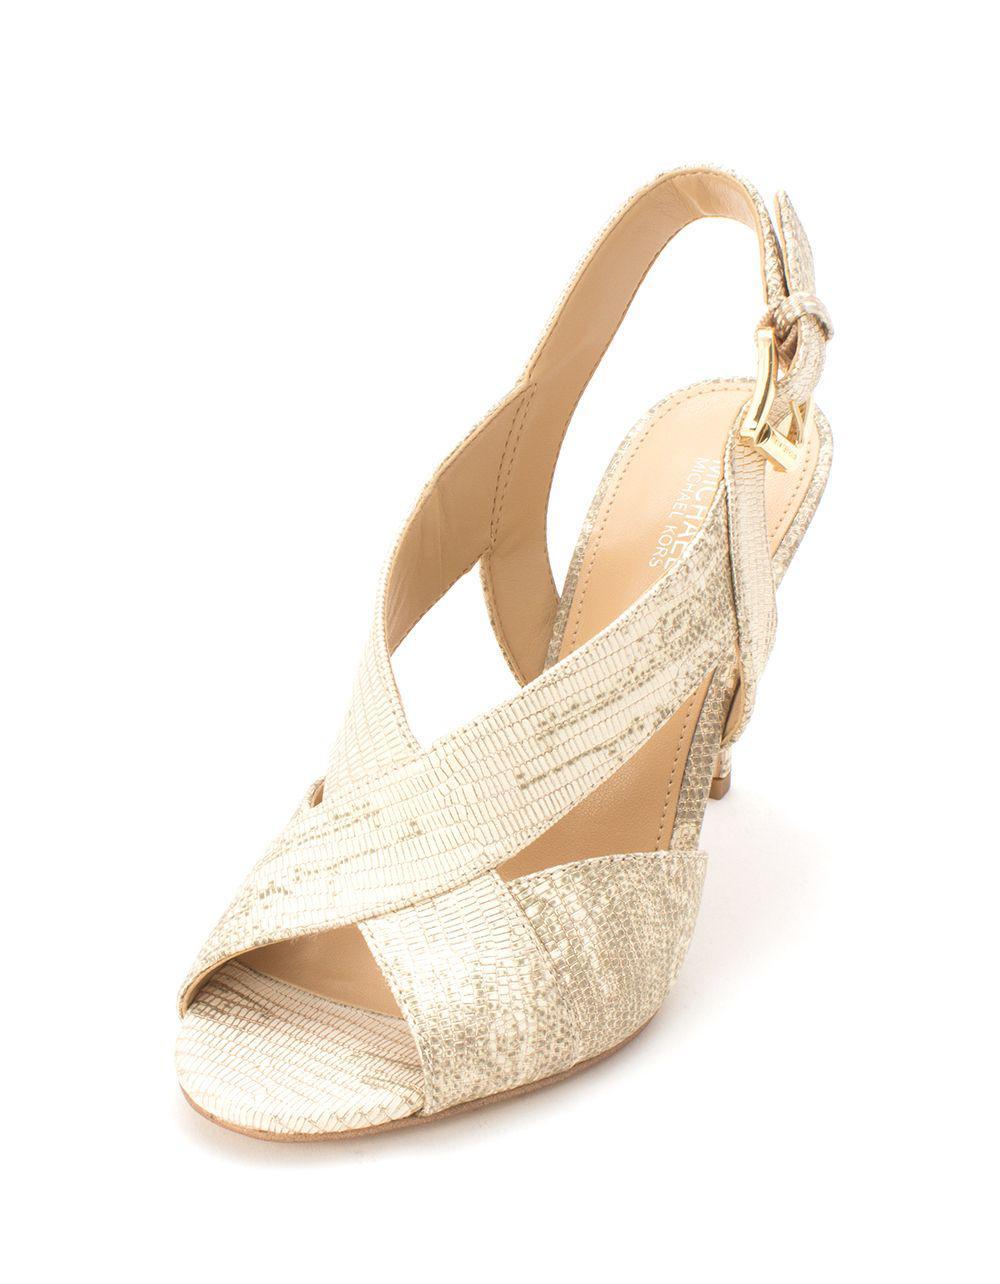 a1f4d51c754 Michael Kors - Metallic Womens Becky Open Toe Casual Slingback Sandals -  Lyst. View fullscreen